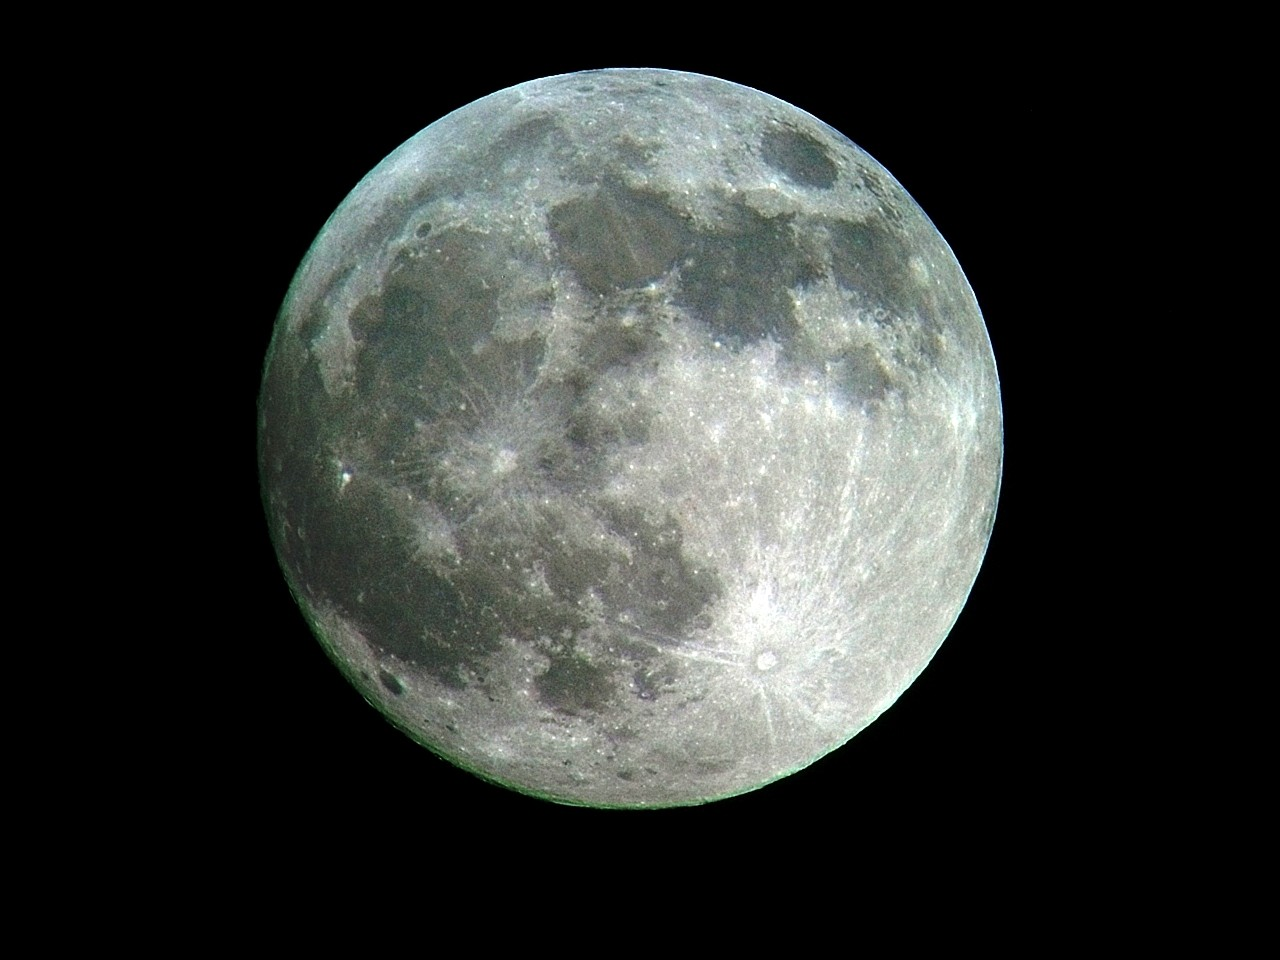 Luna - laisladelaastronomia.com 986cd45449b